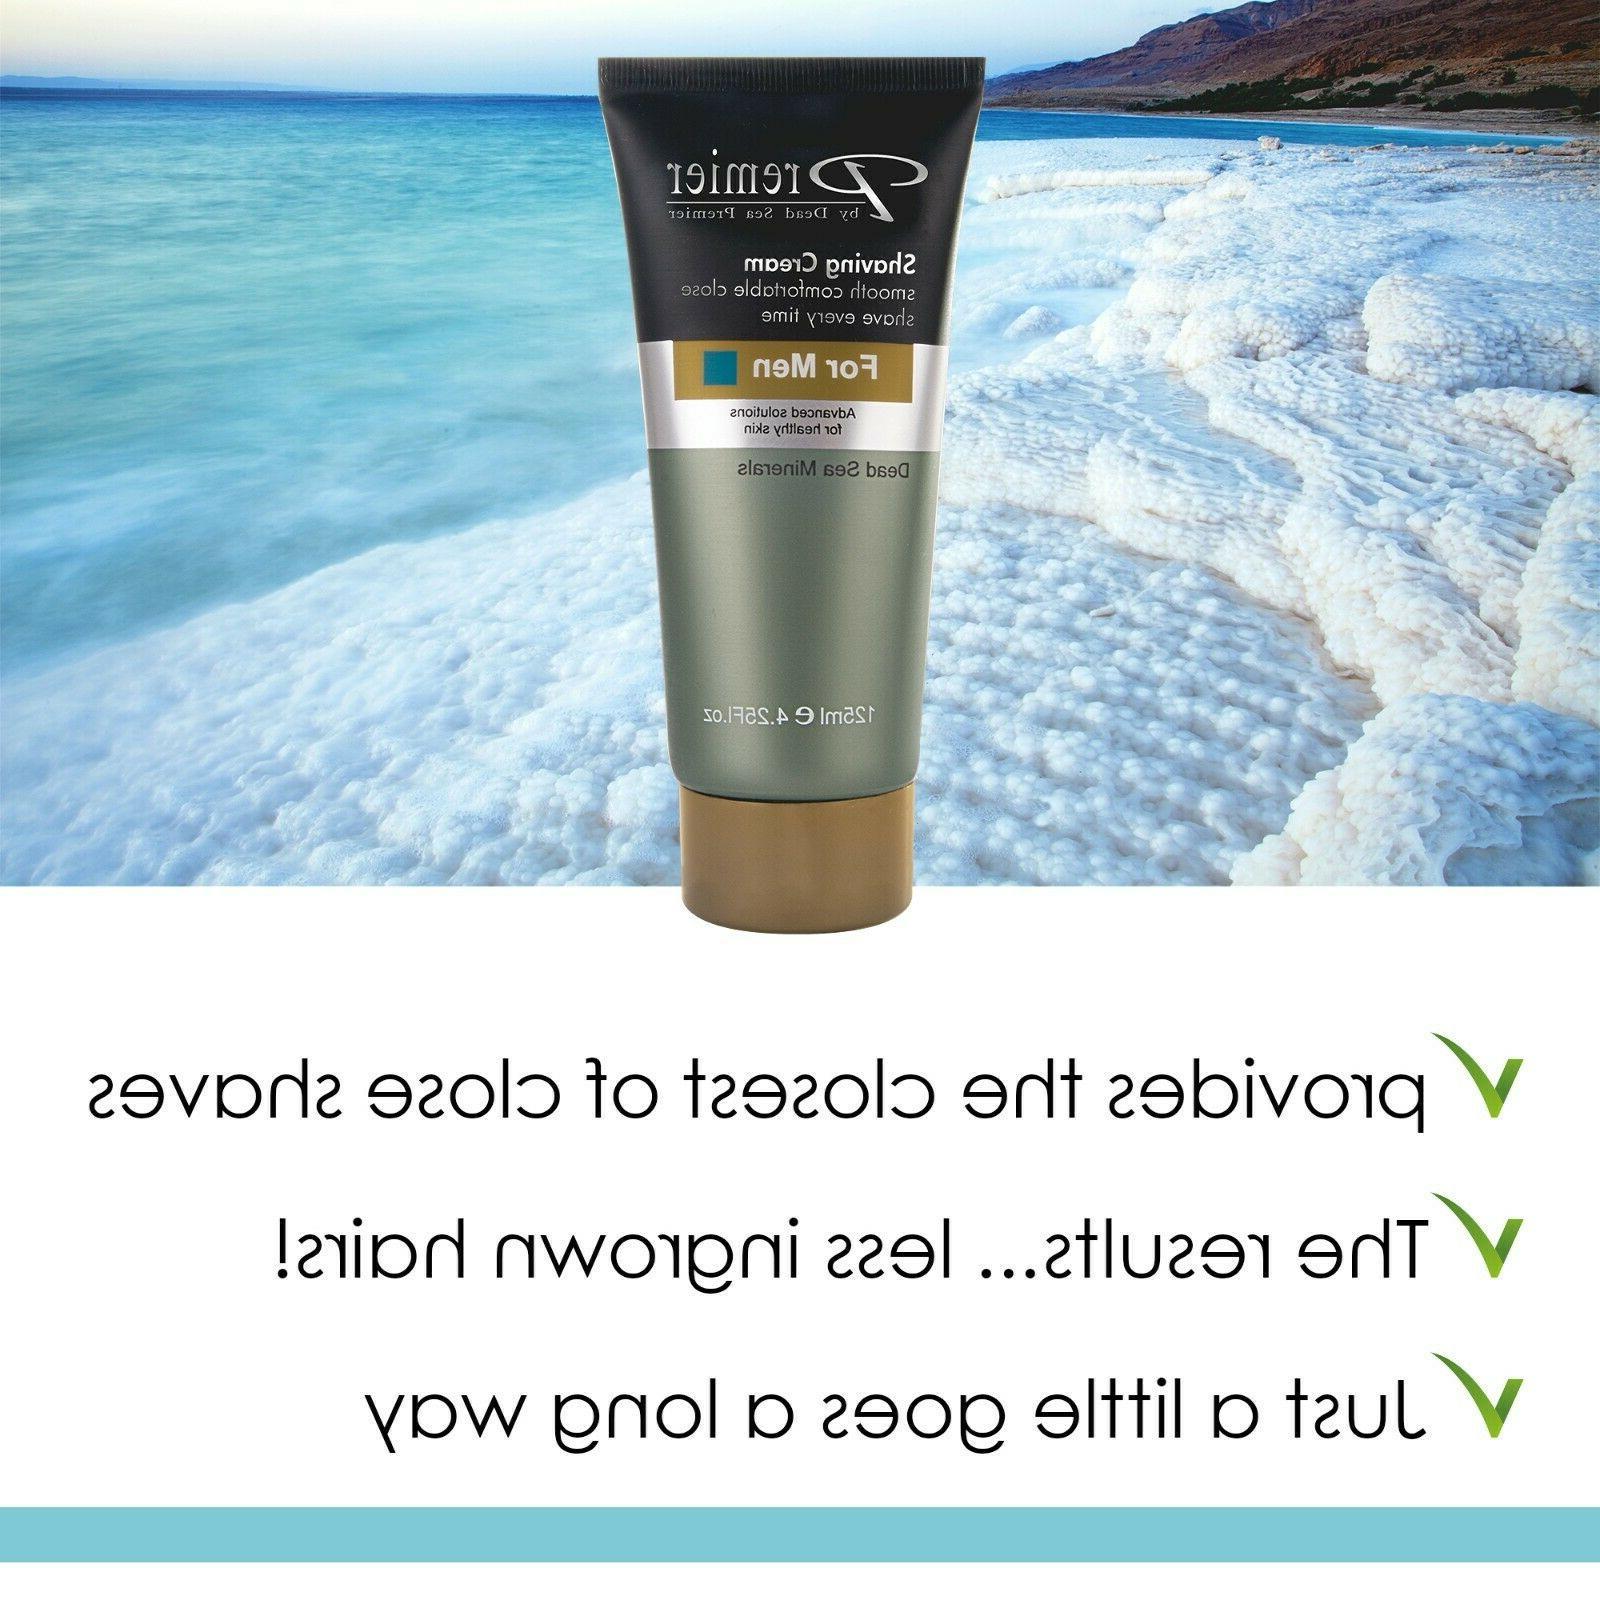 Premier Cream for Men, sensitive skin,protects nicks 4.2fl